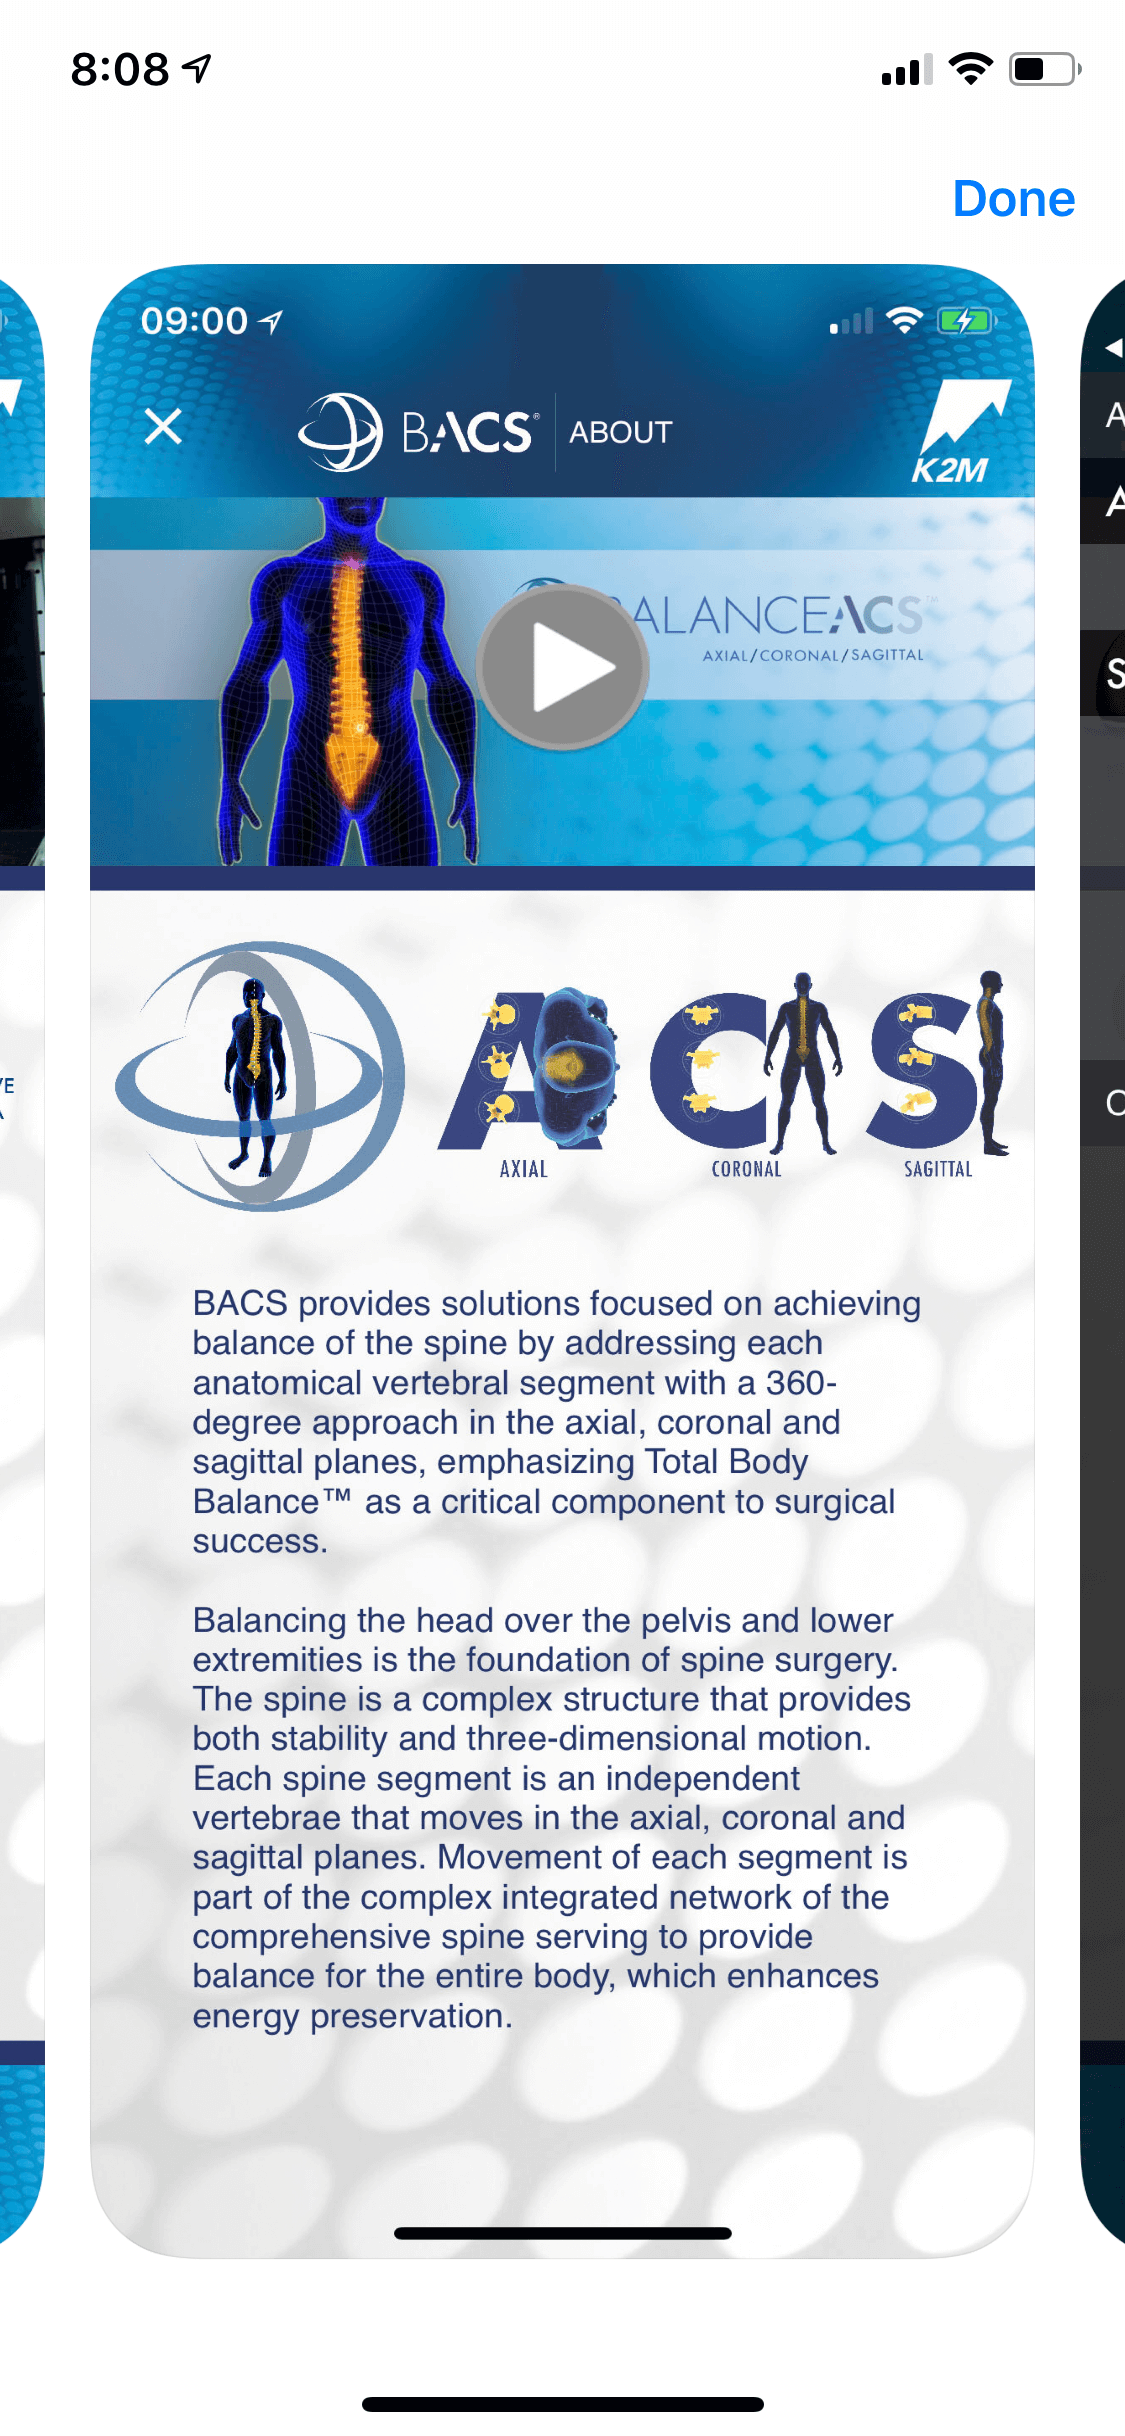 K2M BalanceACS app